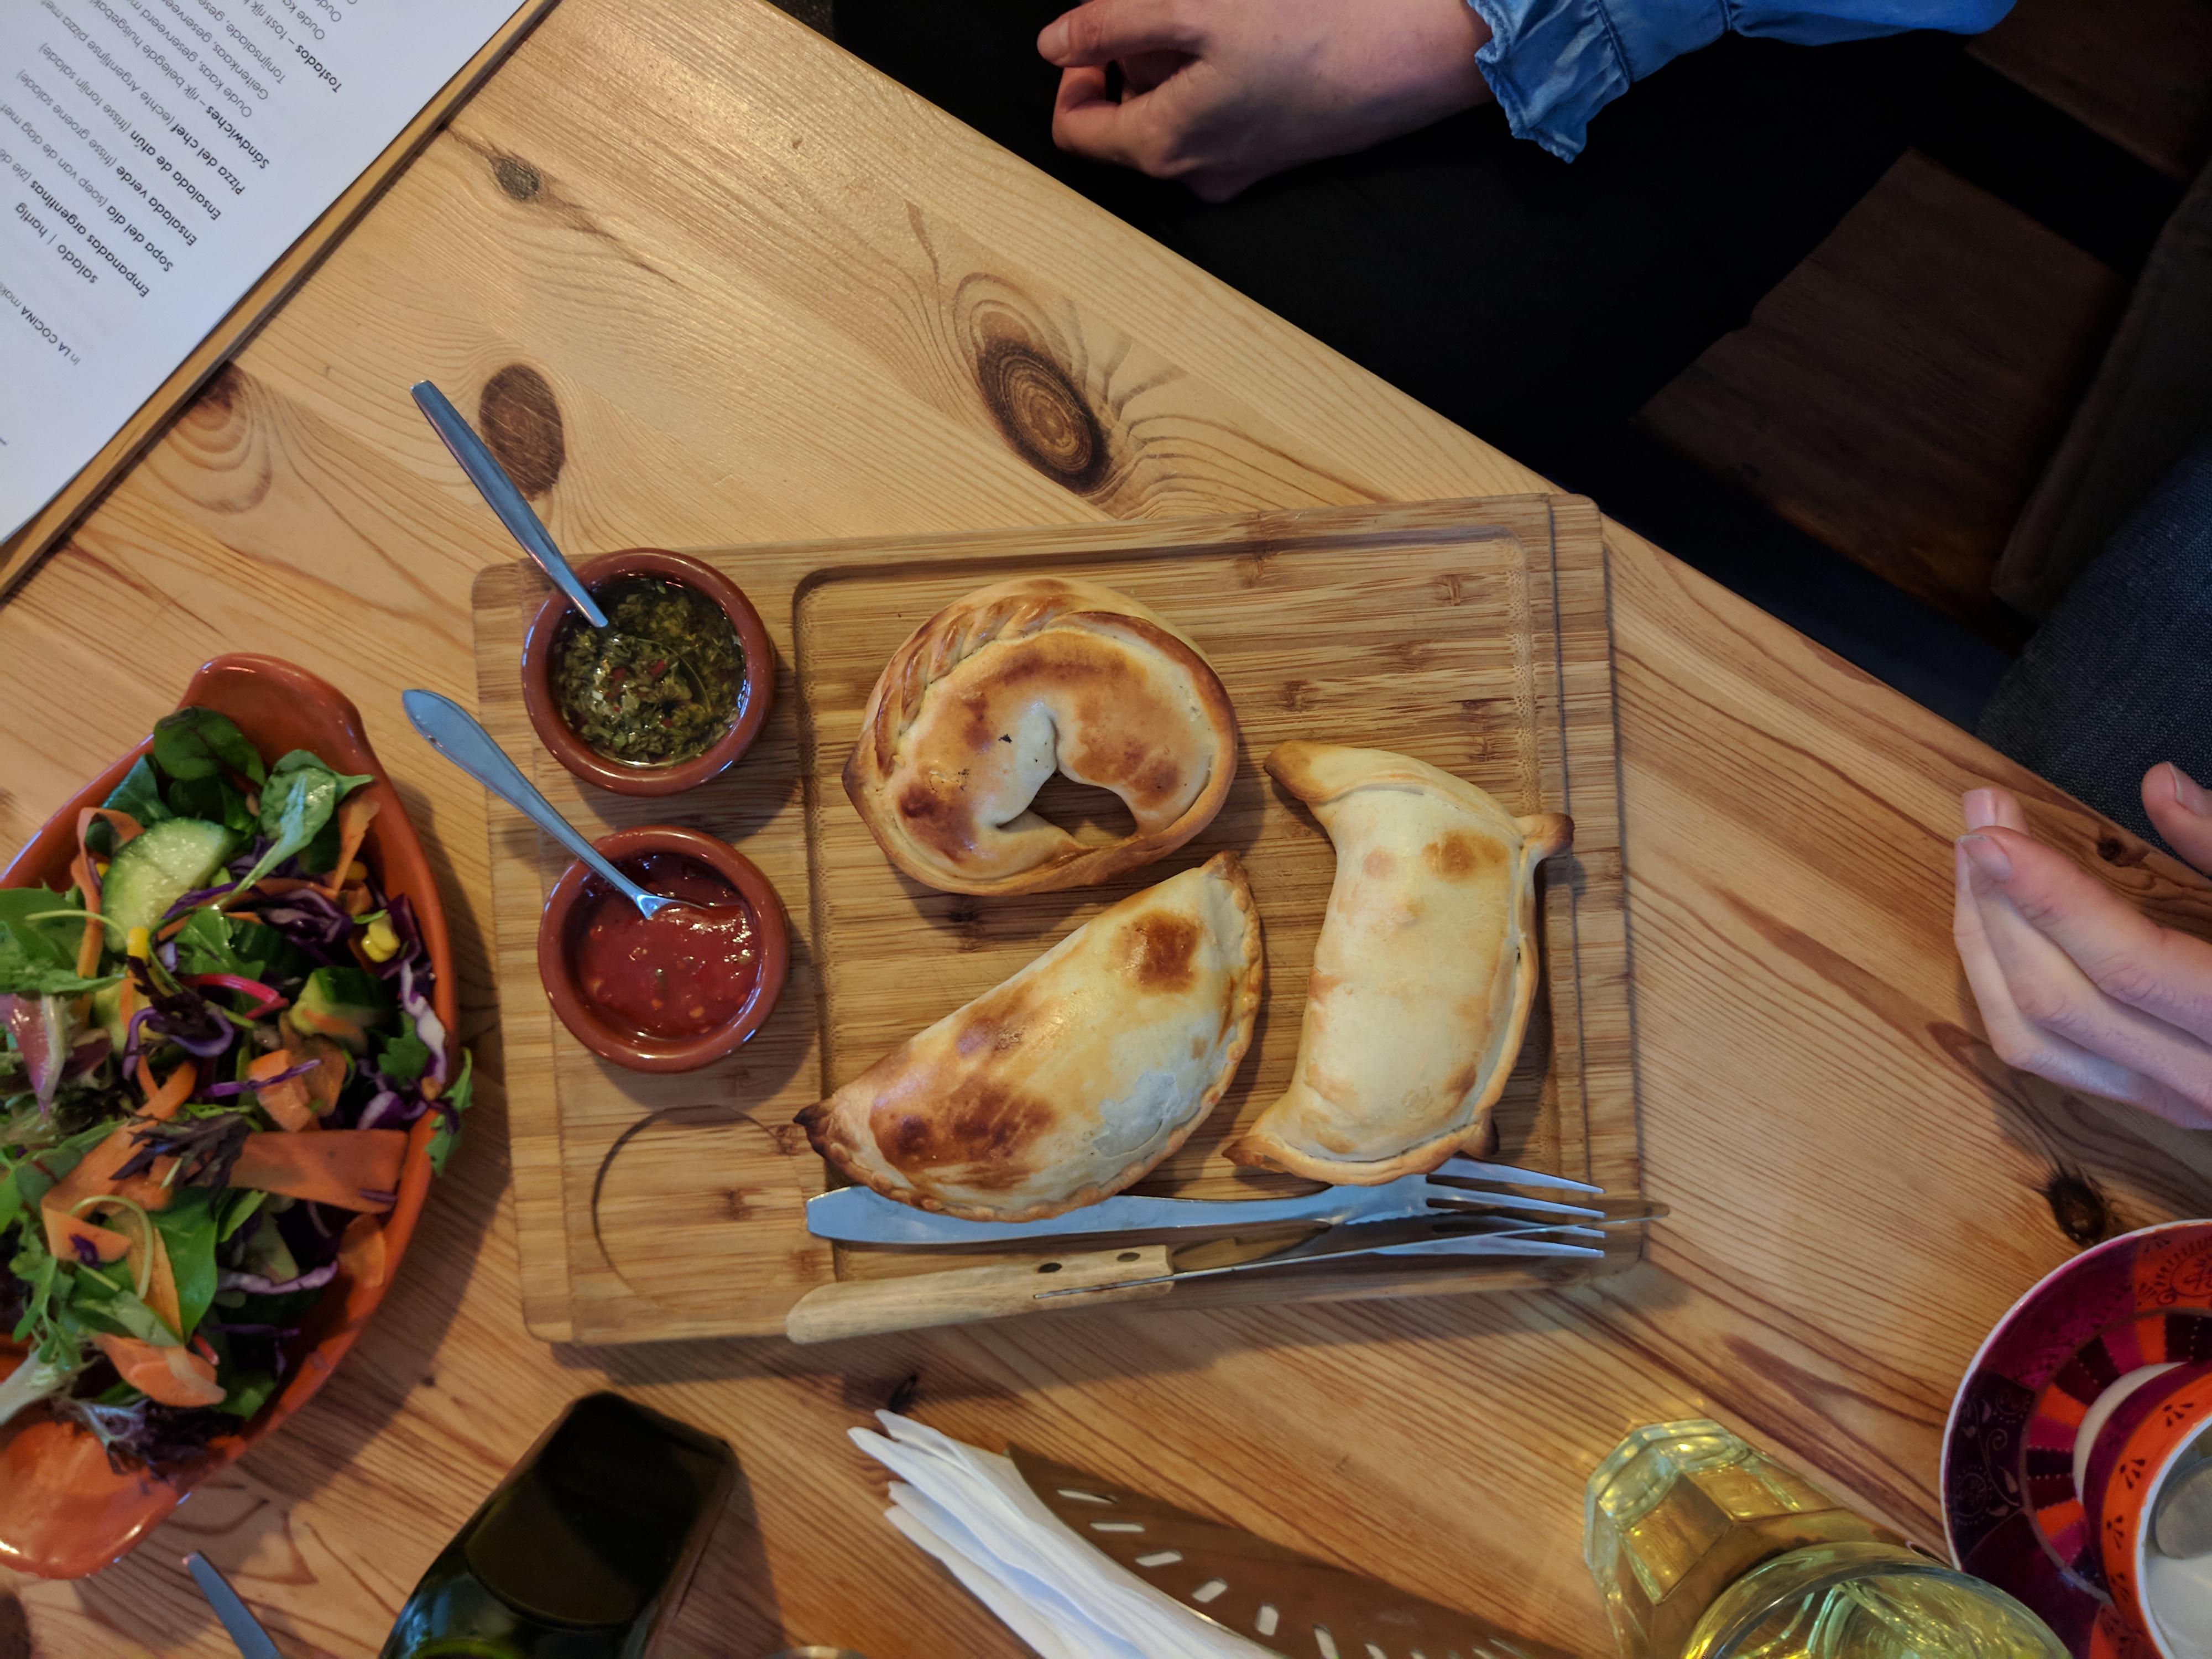 Meneer eet uit: la cocina empanadas in Amsterdam-Noord